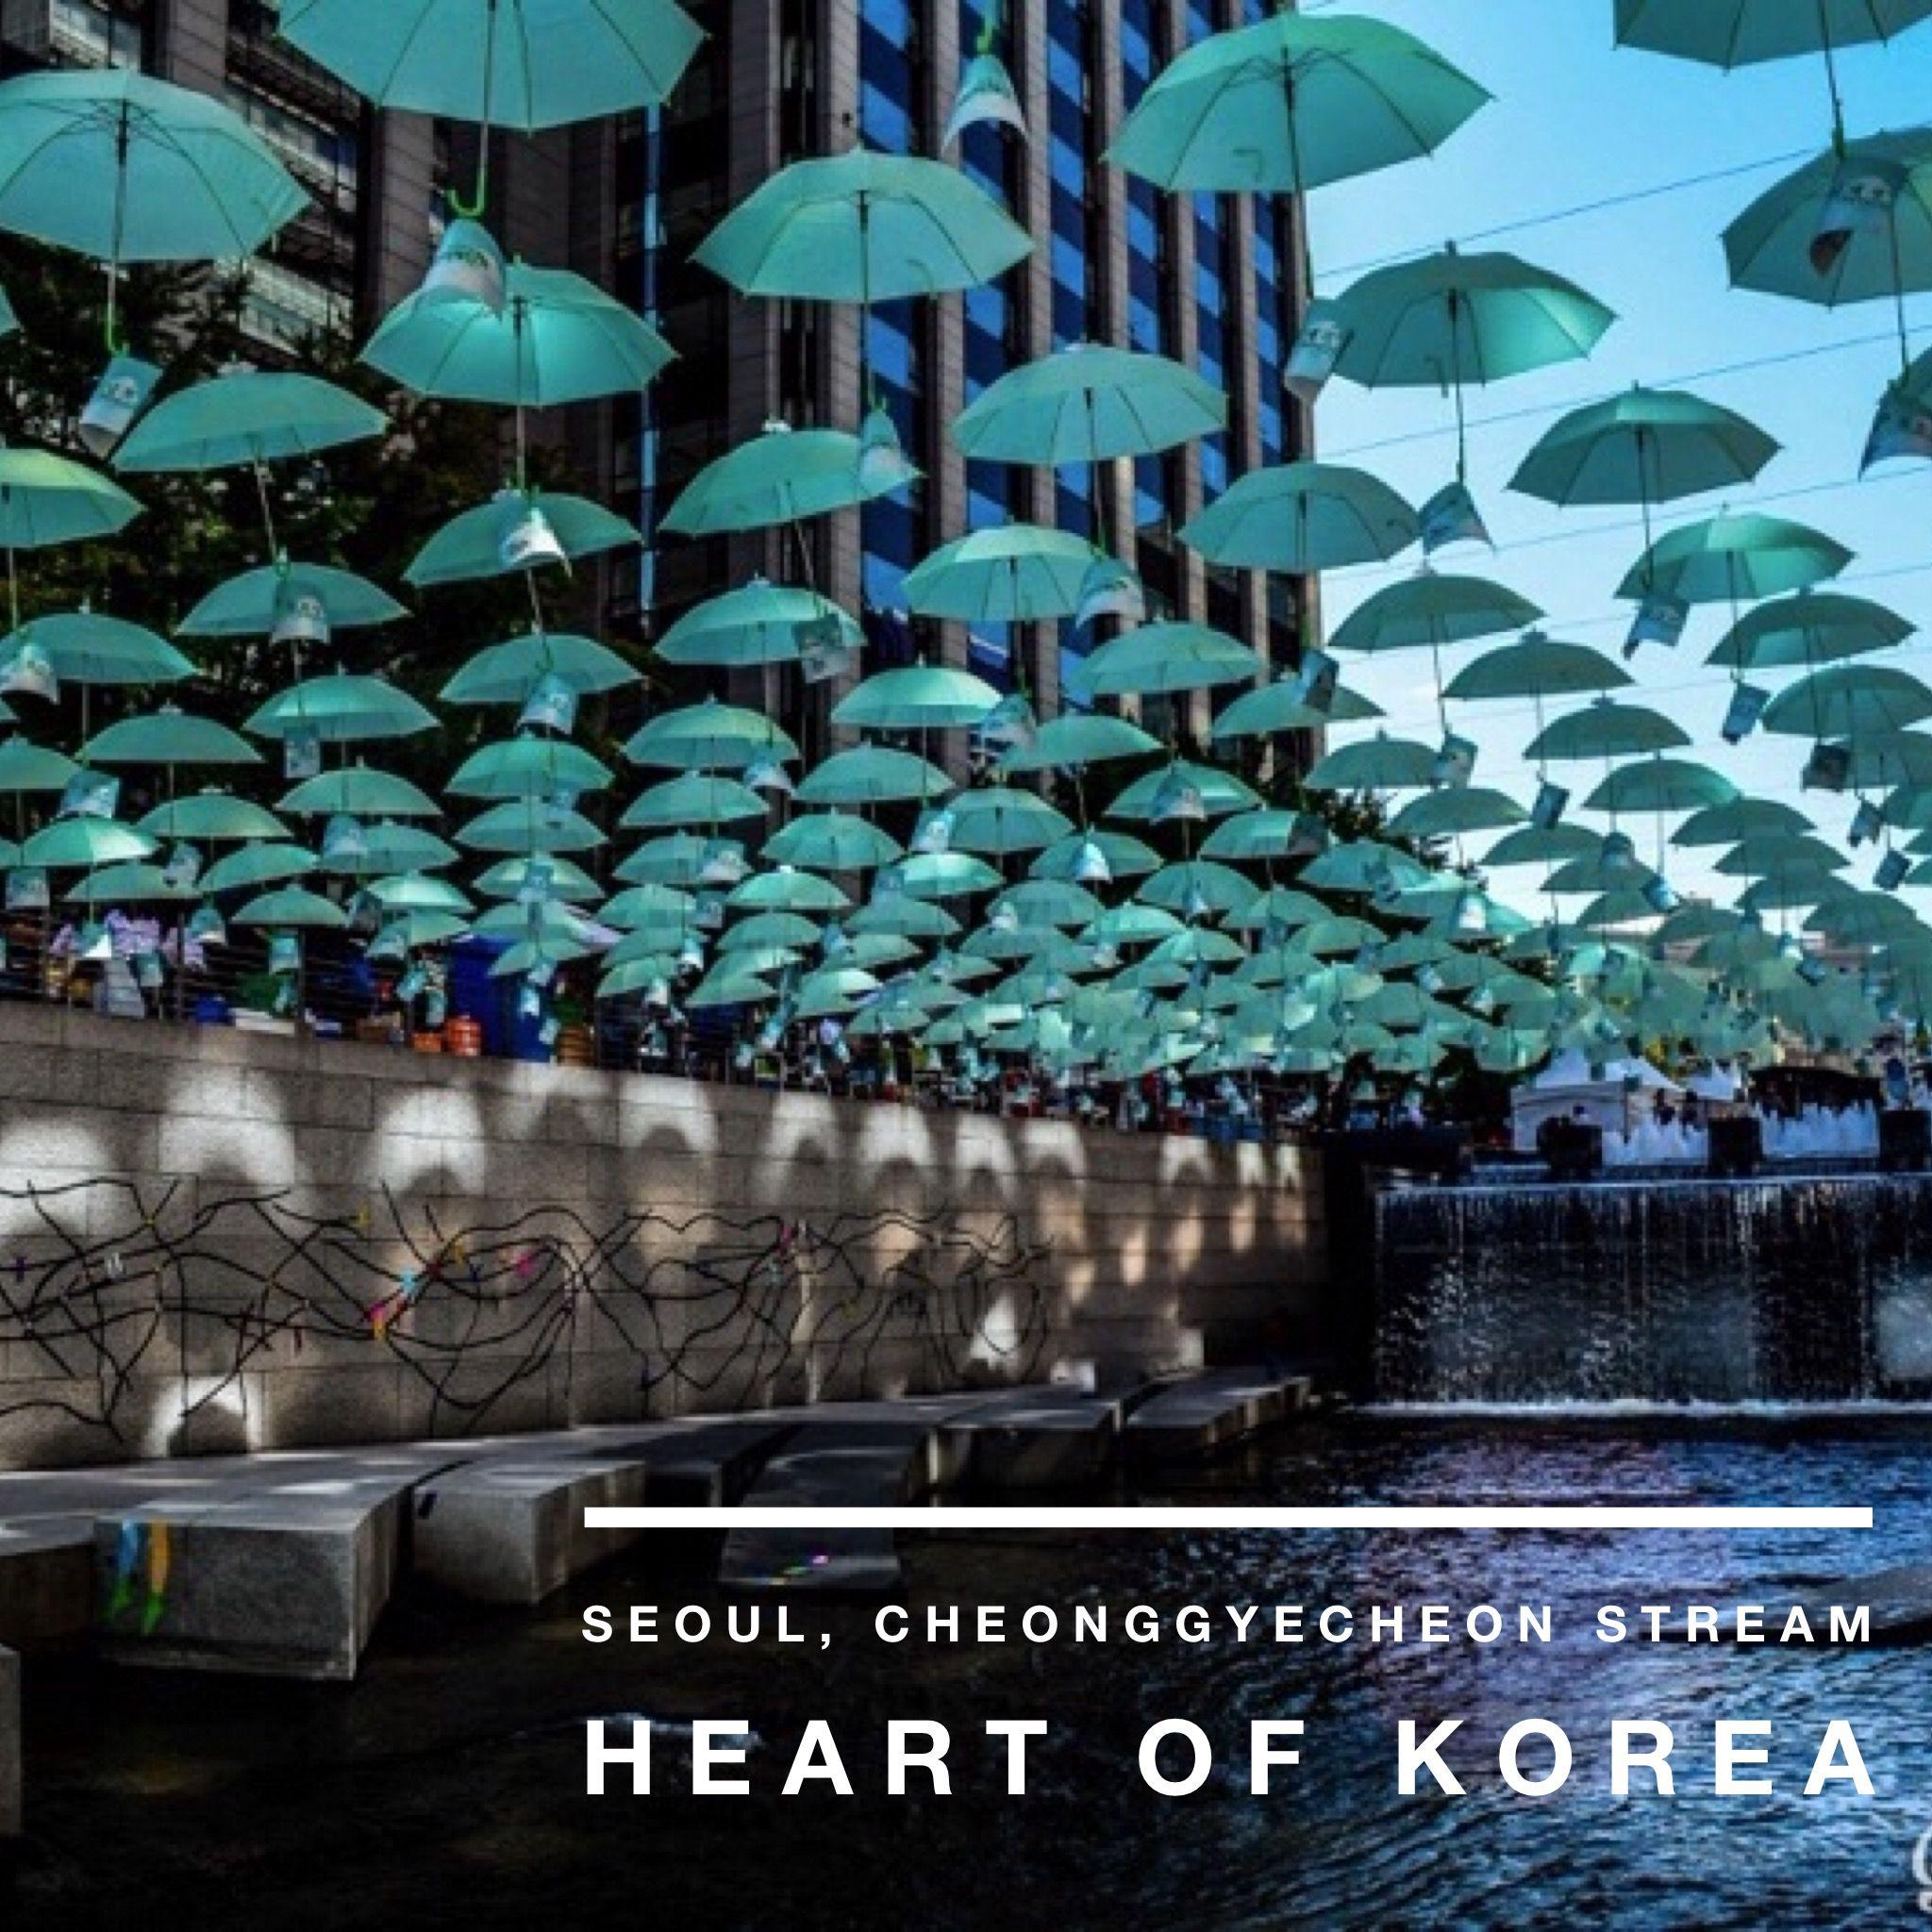 Seoul, Cheonggyecheon Stream - Heart of Korea